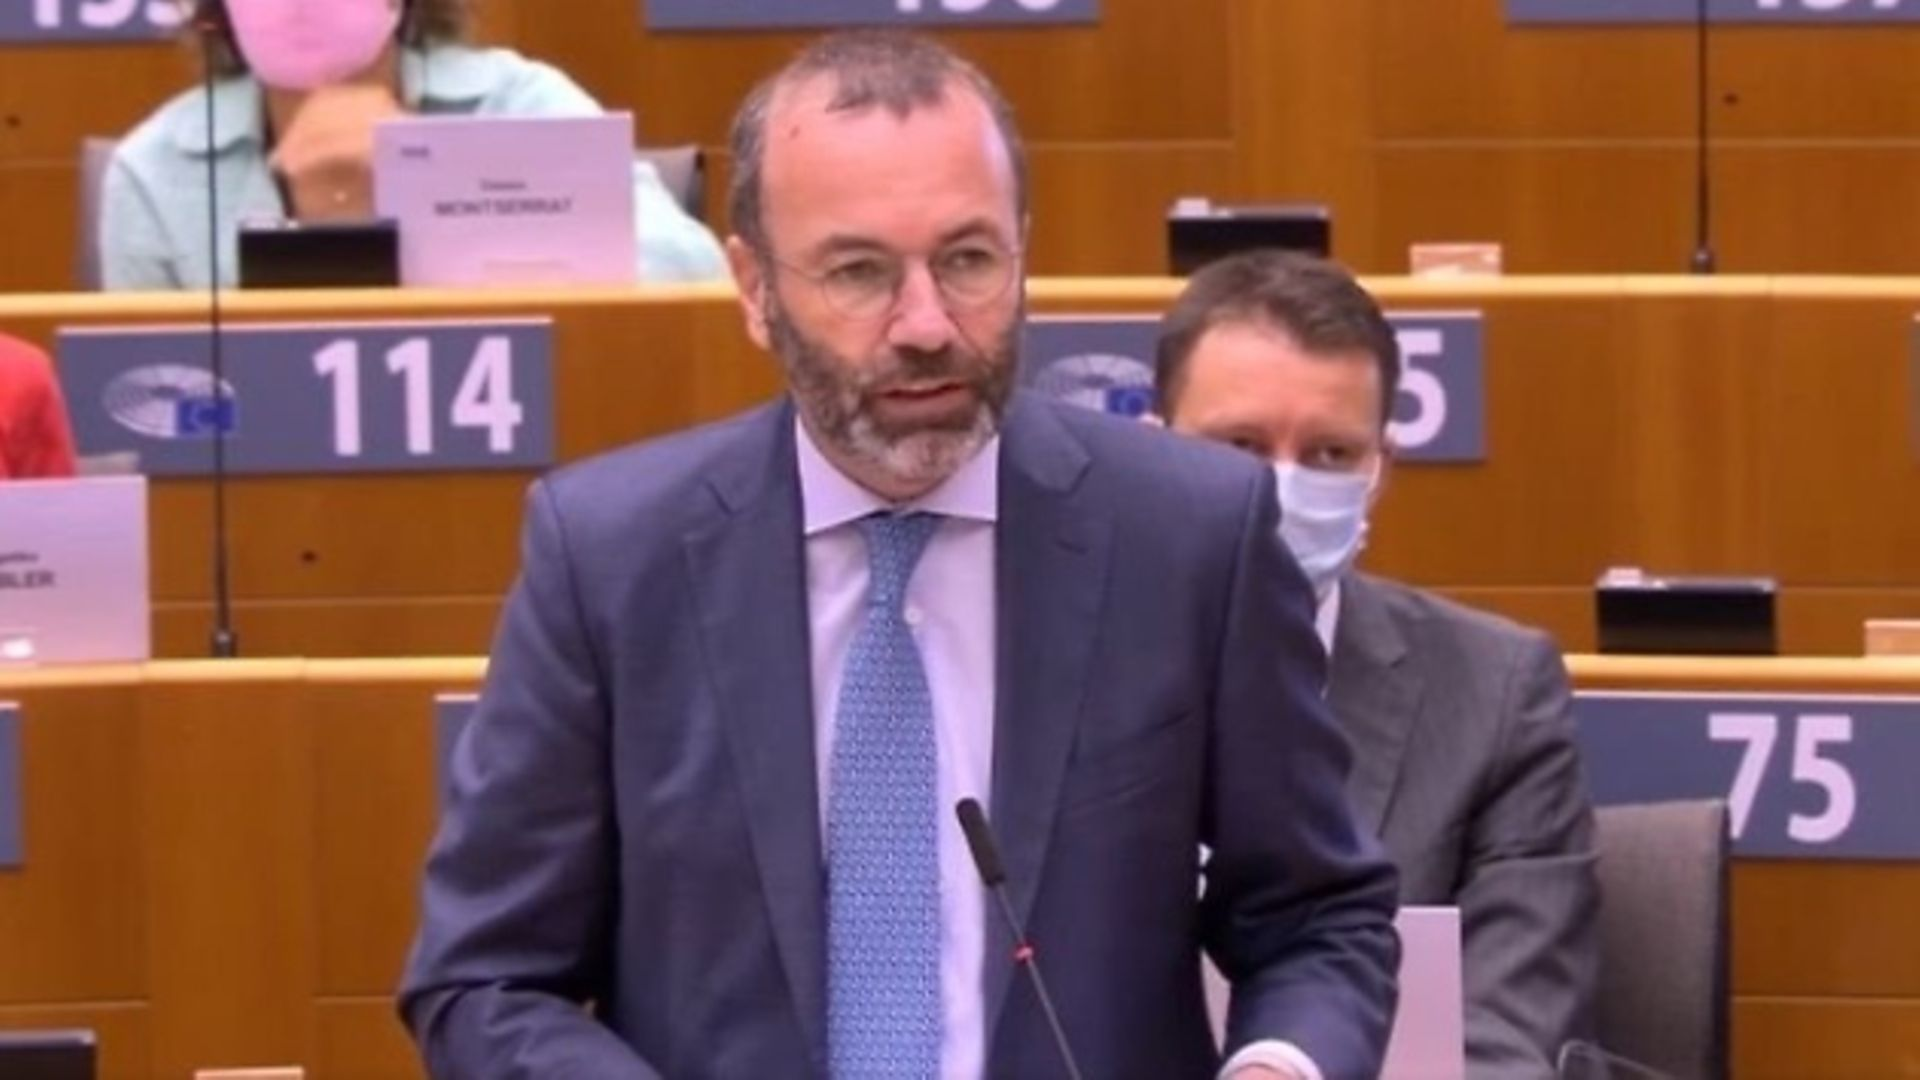 Manfred Weber in the European parliament - Credit: European parliament